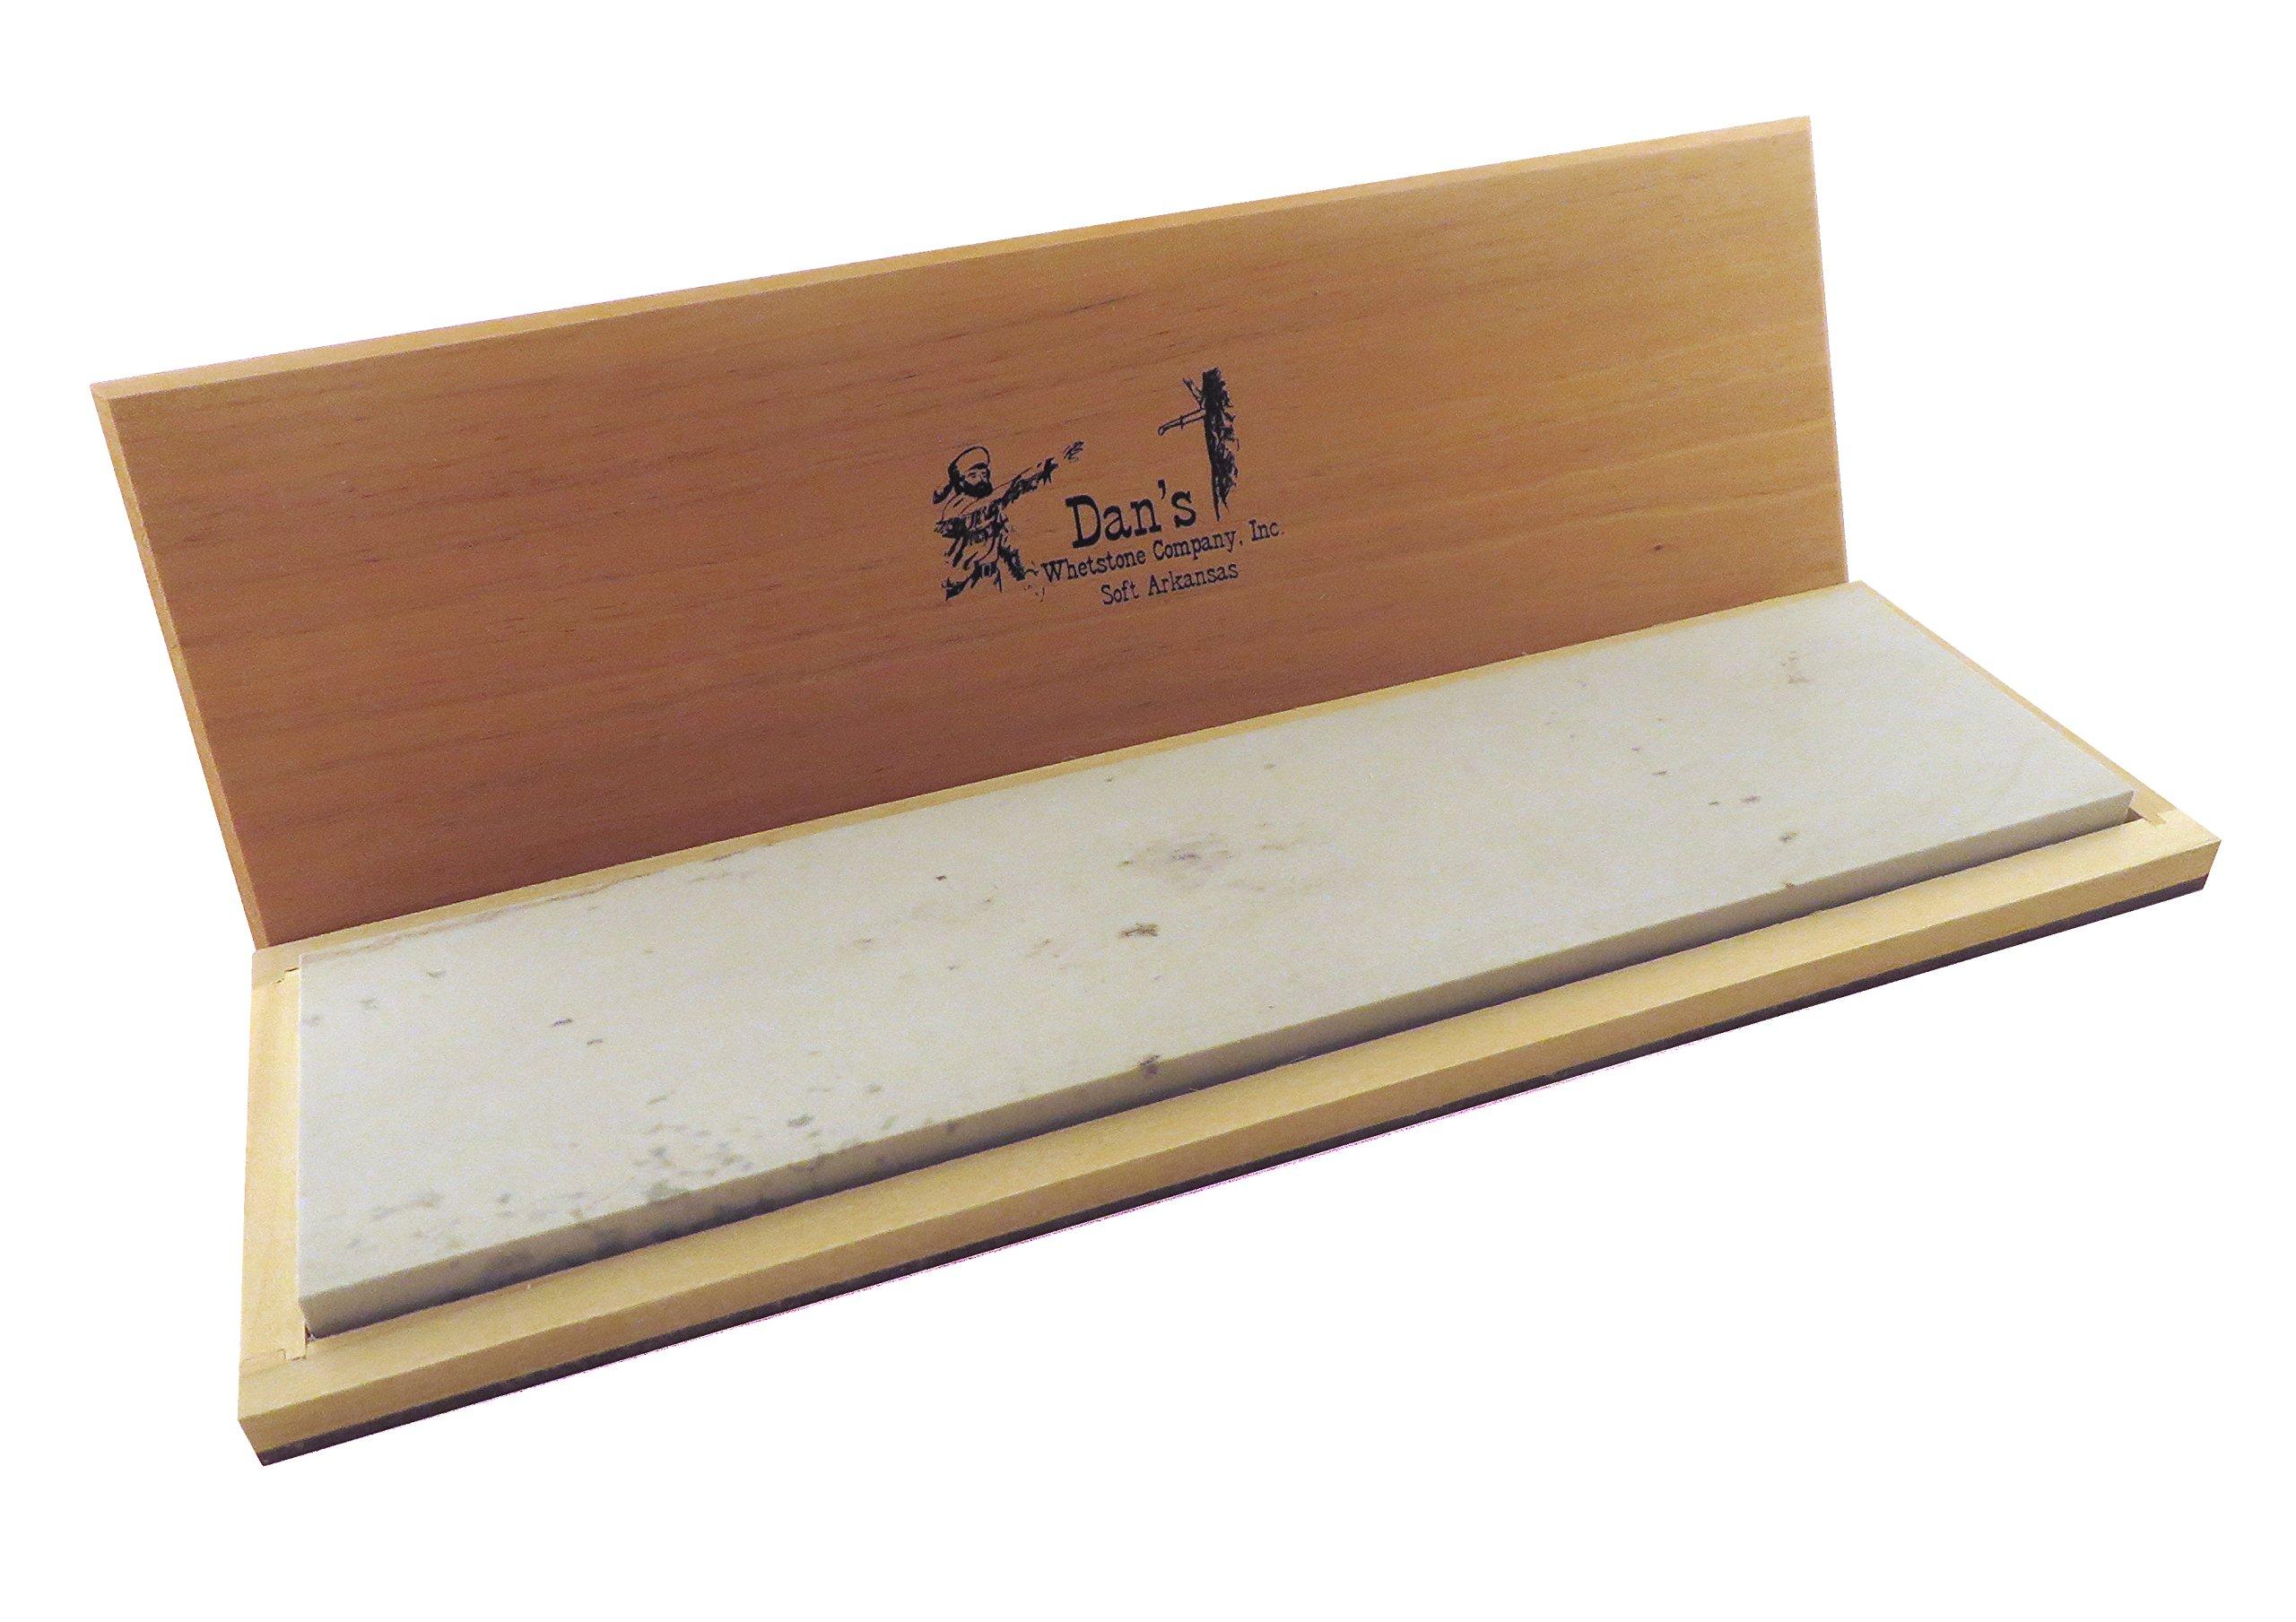 Super Large Genuine Arkansas Soft (Medium) Knife Sharpening Bench Stone Whetstone 12'' x 3'' x 1/2'' in Wood Box MAB-1232-C